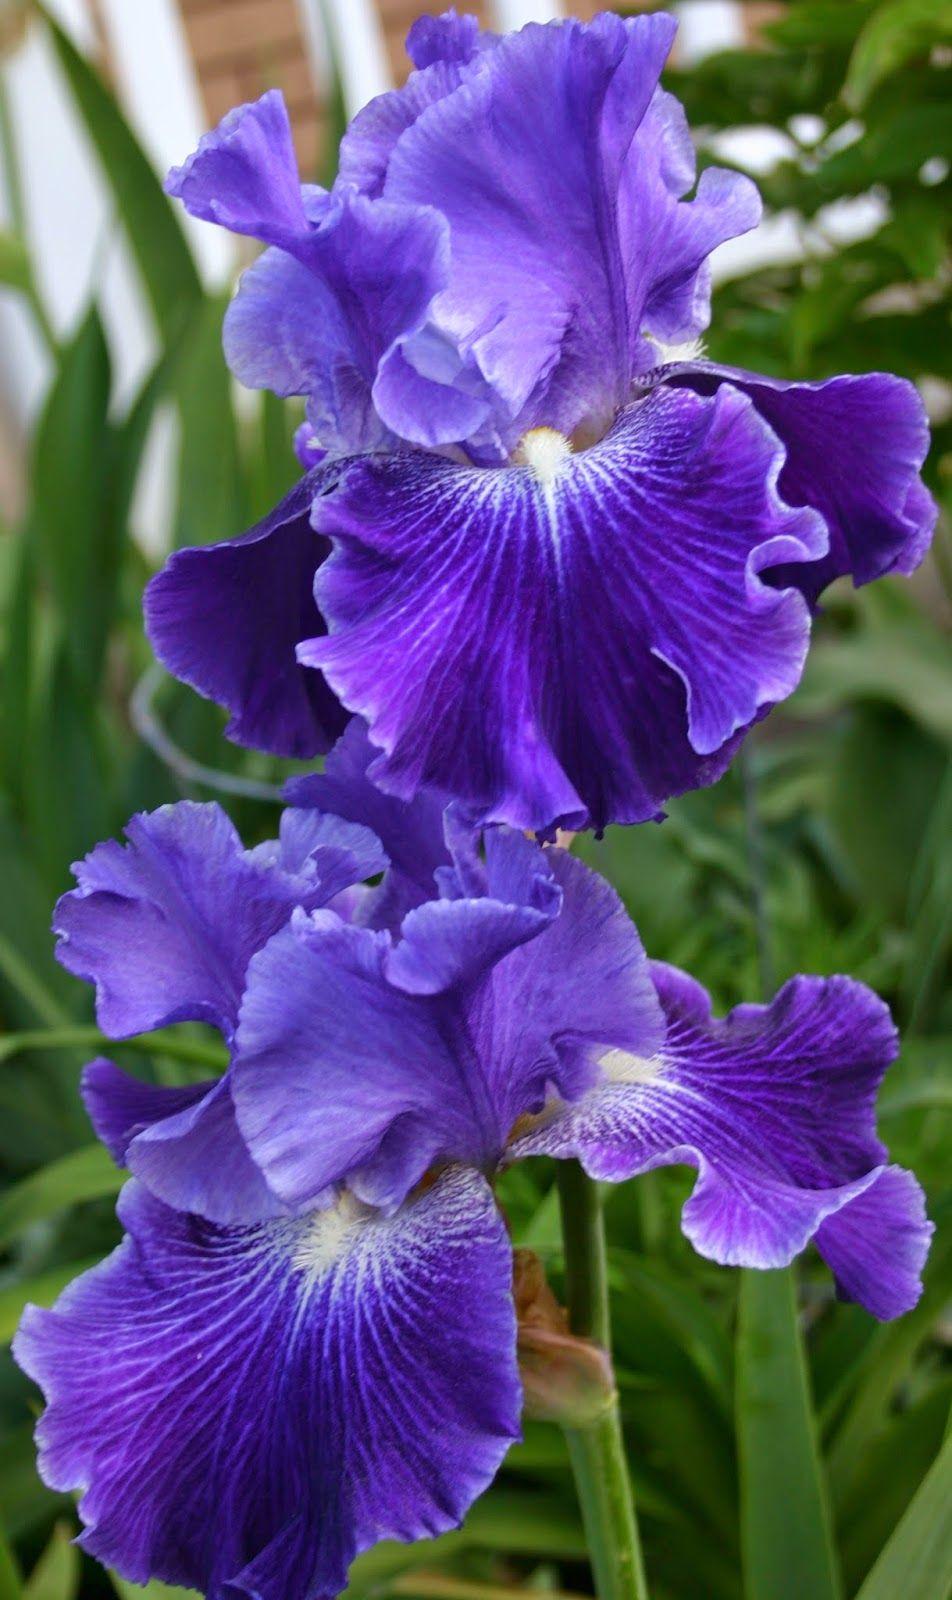 World Of Irises The Blue Iris Garden Planting A Monochromatic Tall Bearded Iris Bed Iris Garden Iris Flowers Garden Iris Flowers